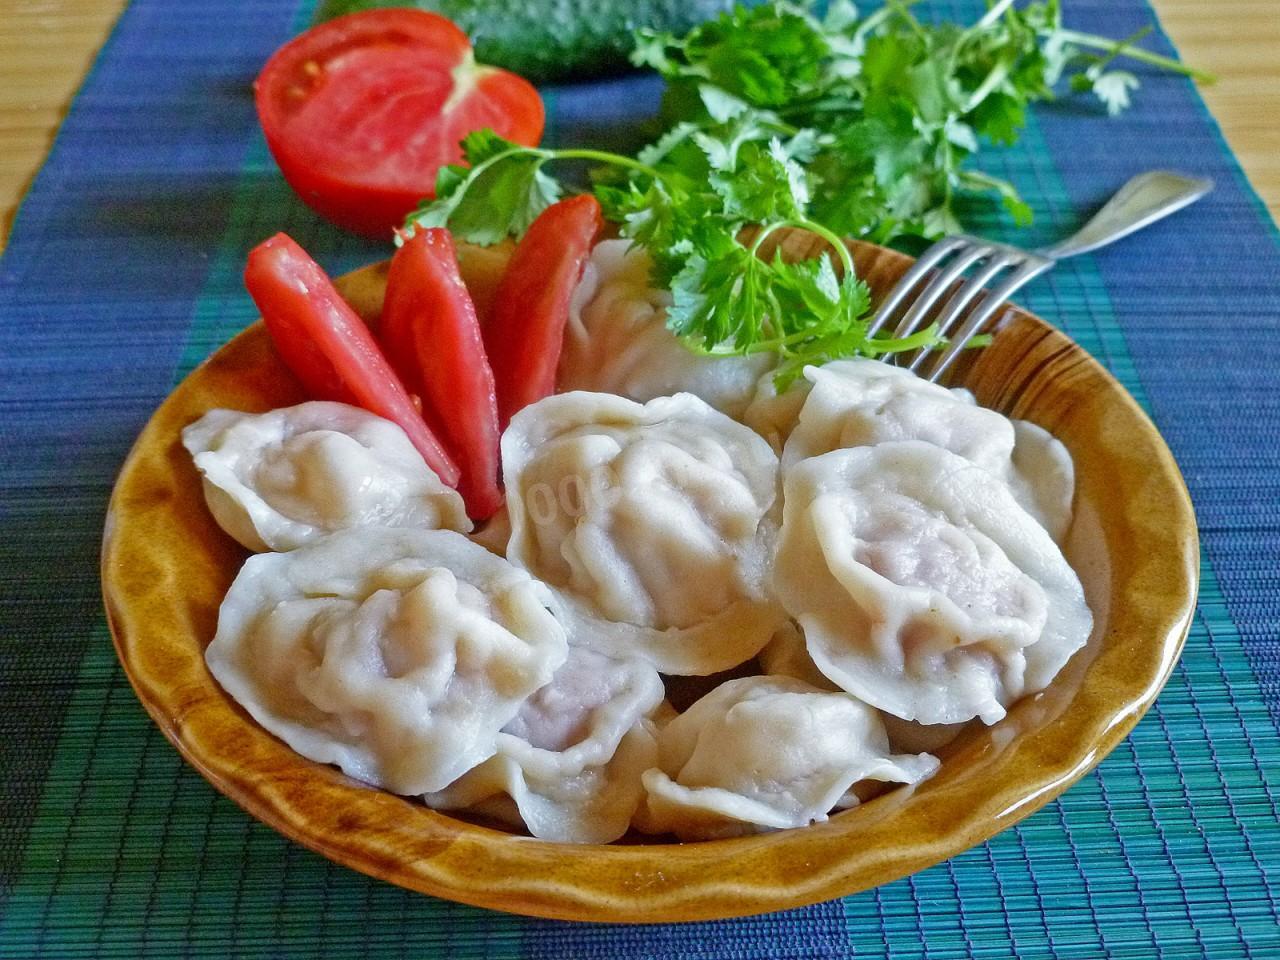 Пельмени сибирские рецепт с фото пошагово | 1000.menu: https://1000.menu/cooking/2500-pelmeni-sibirskie